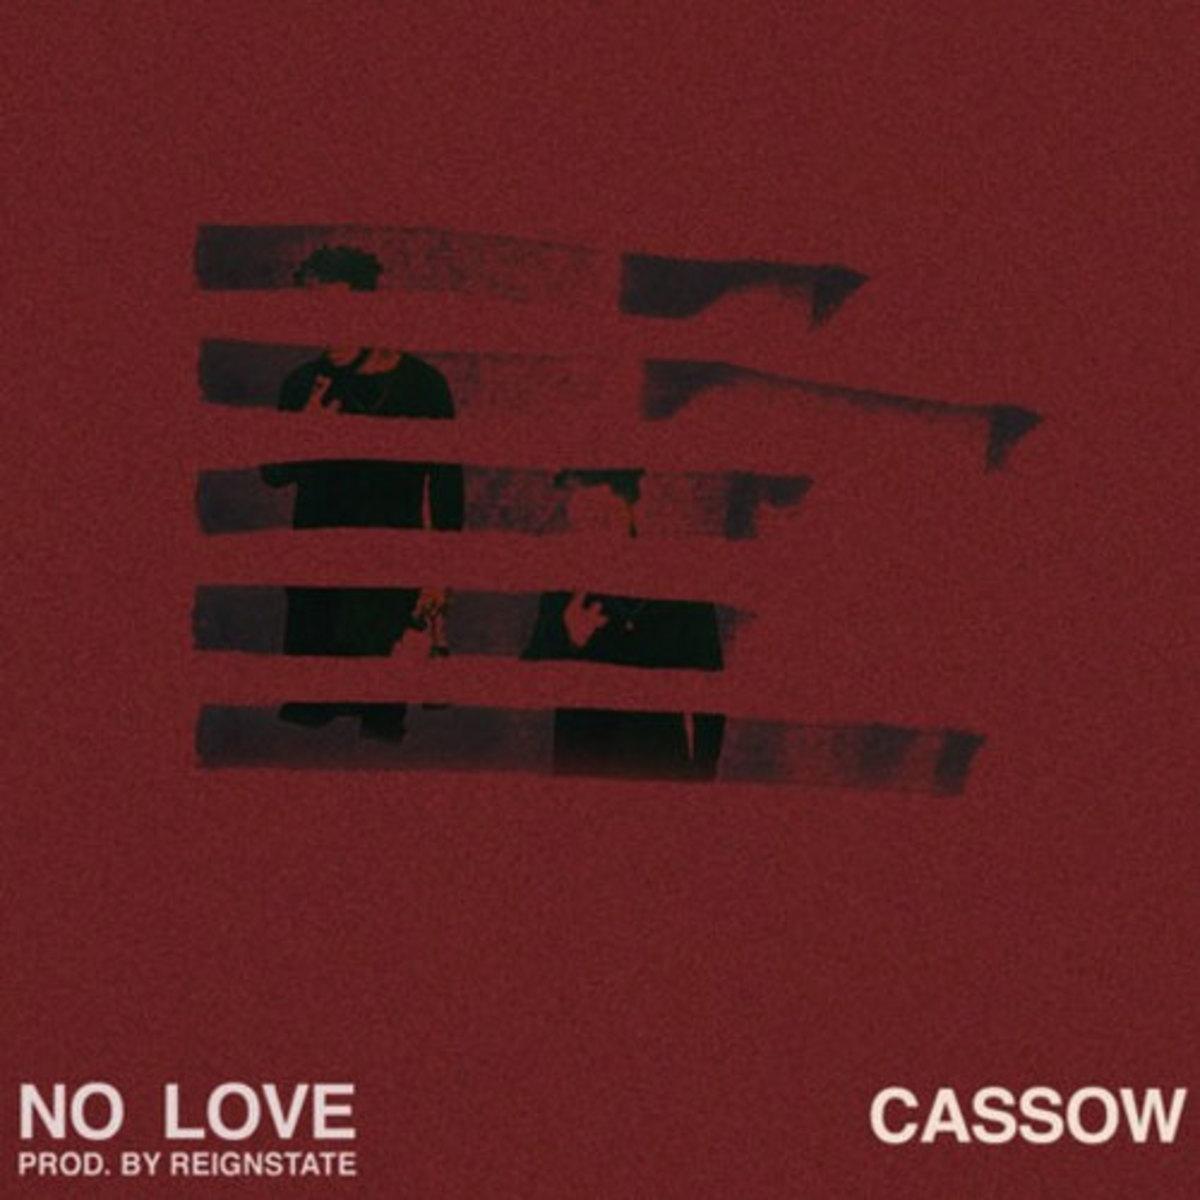 cassow-no-love2.jpg